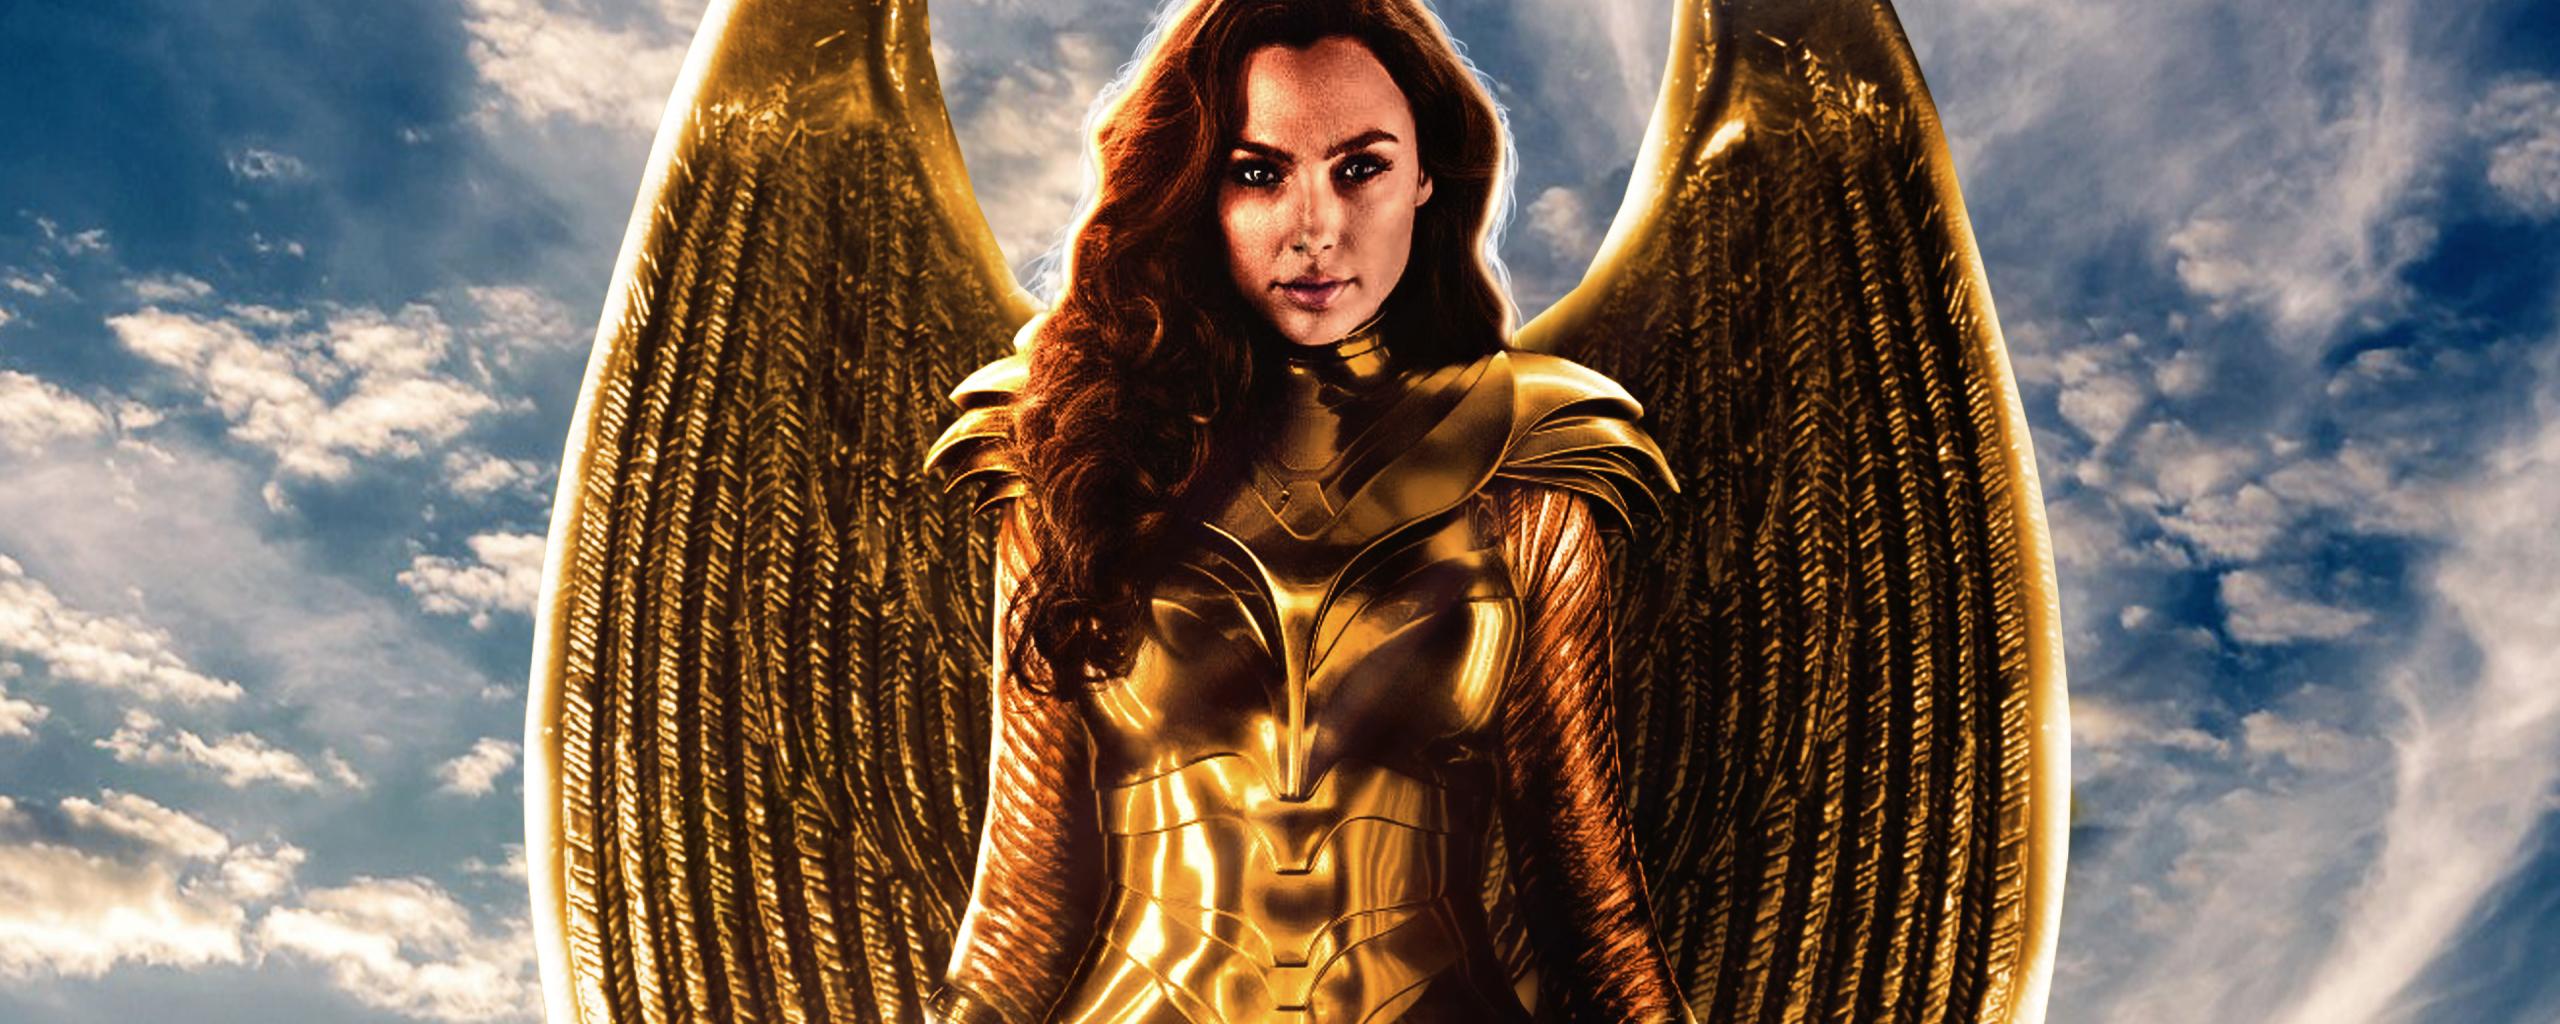 2560x1024 Wonder Woman Golden Eagle Armor 2560x1024 Resolution